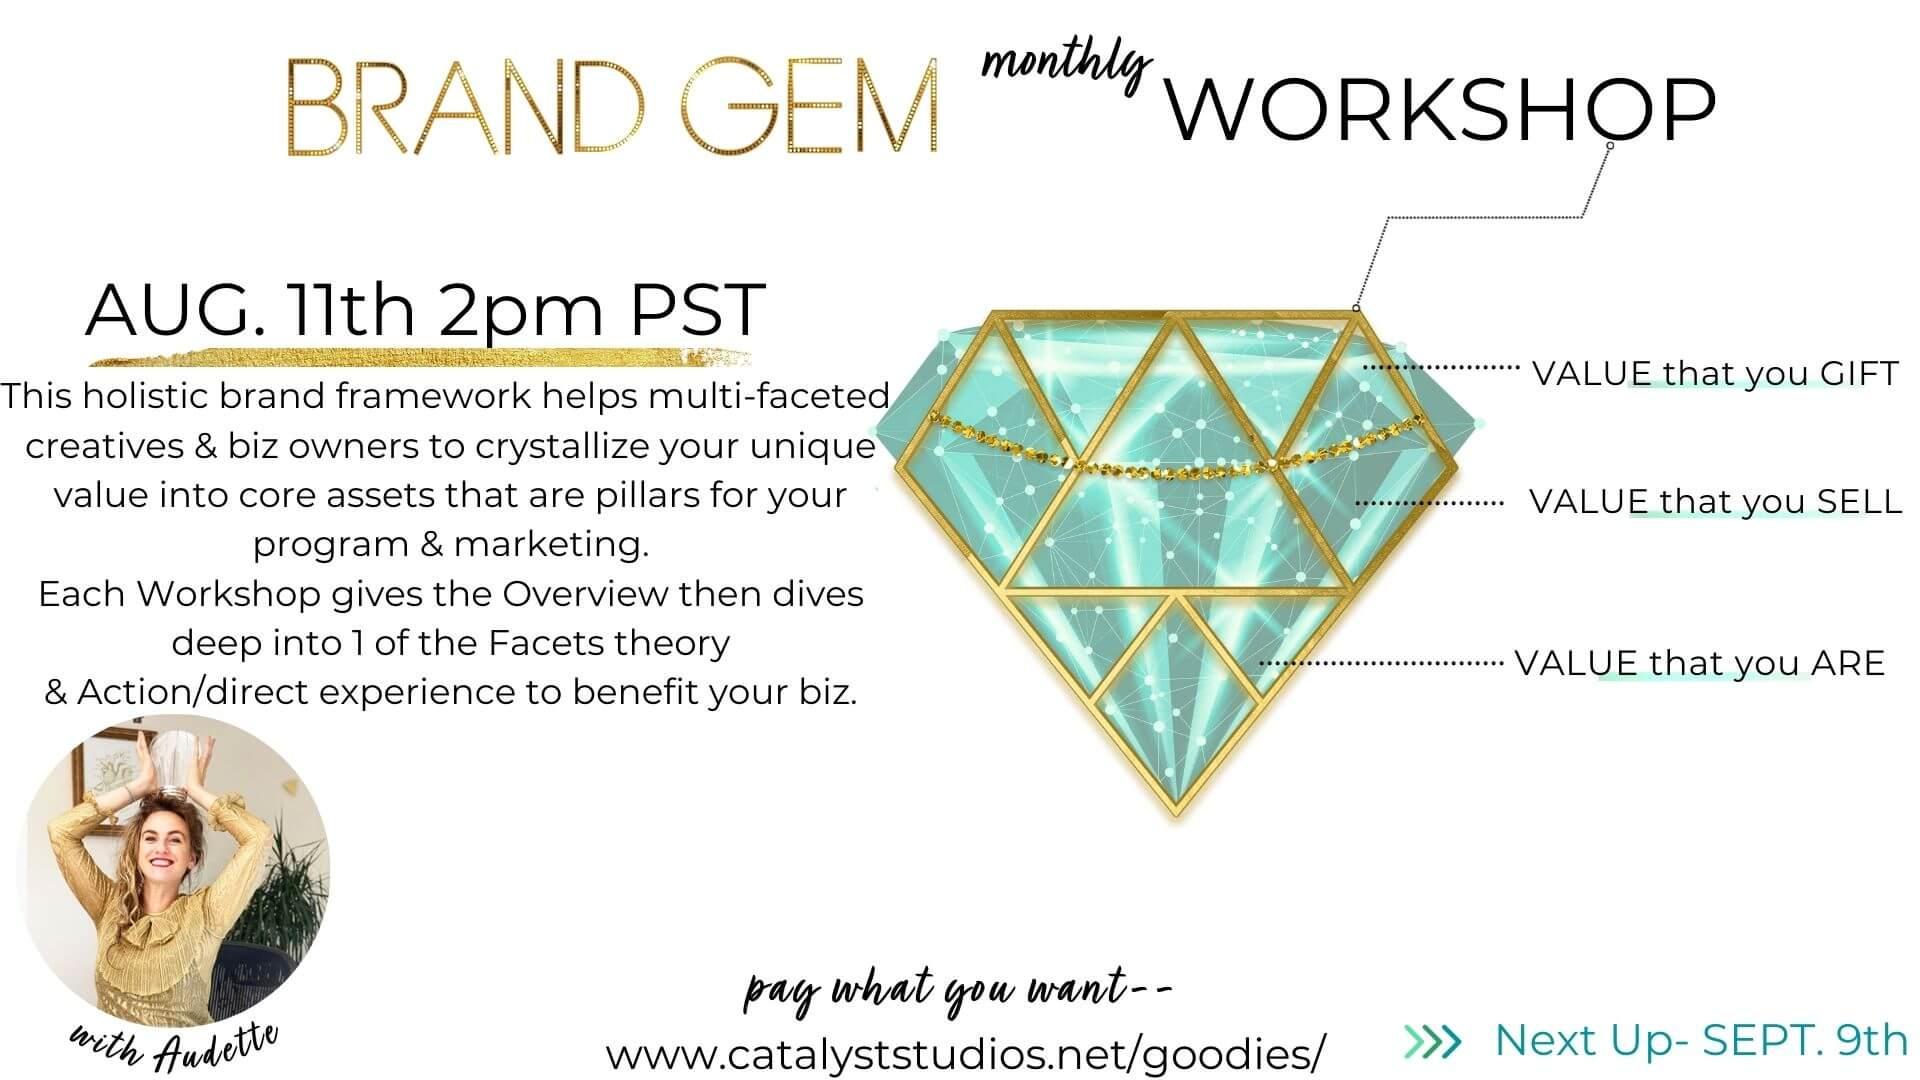 Brand Gem Workshop with Audette Catalyst Studios